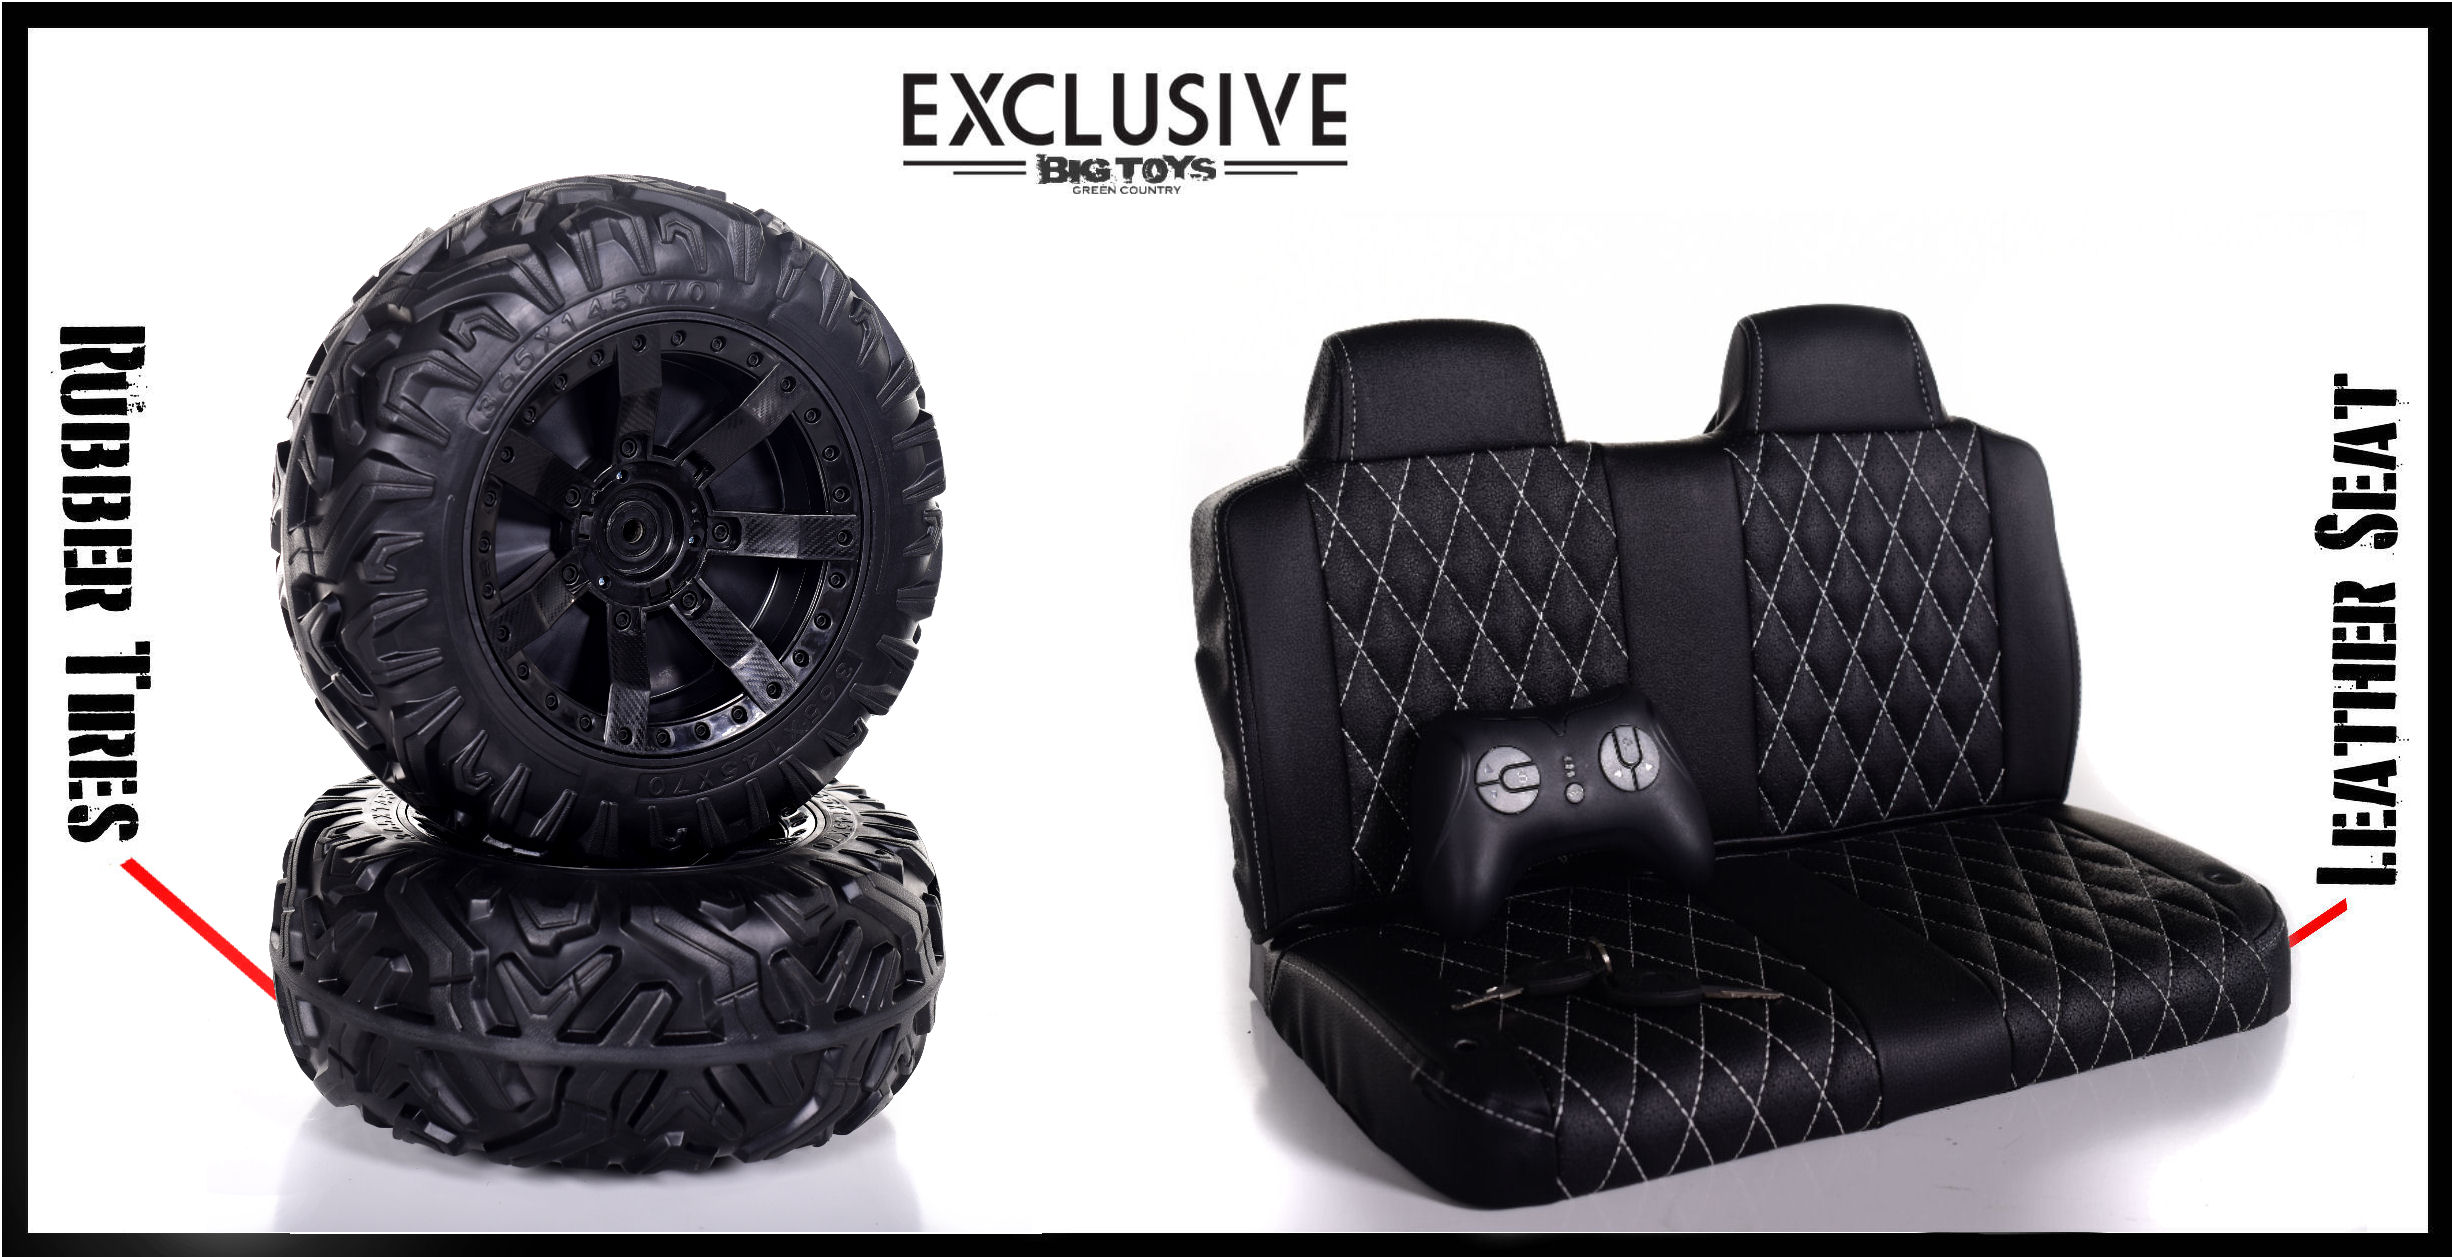 4x4-roamer-seat-tires.jpg